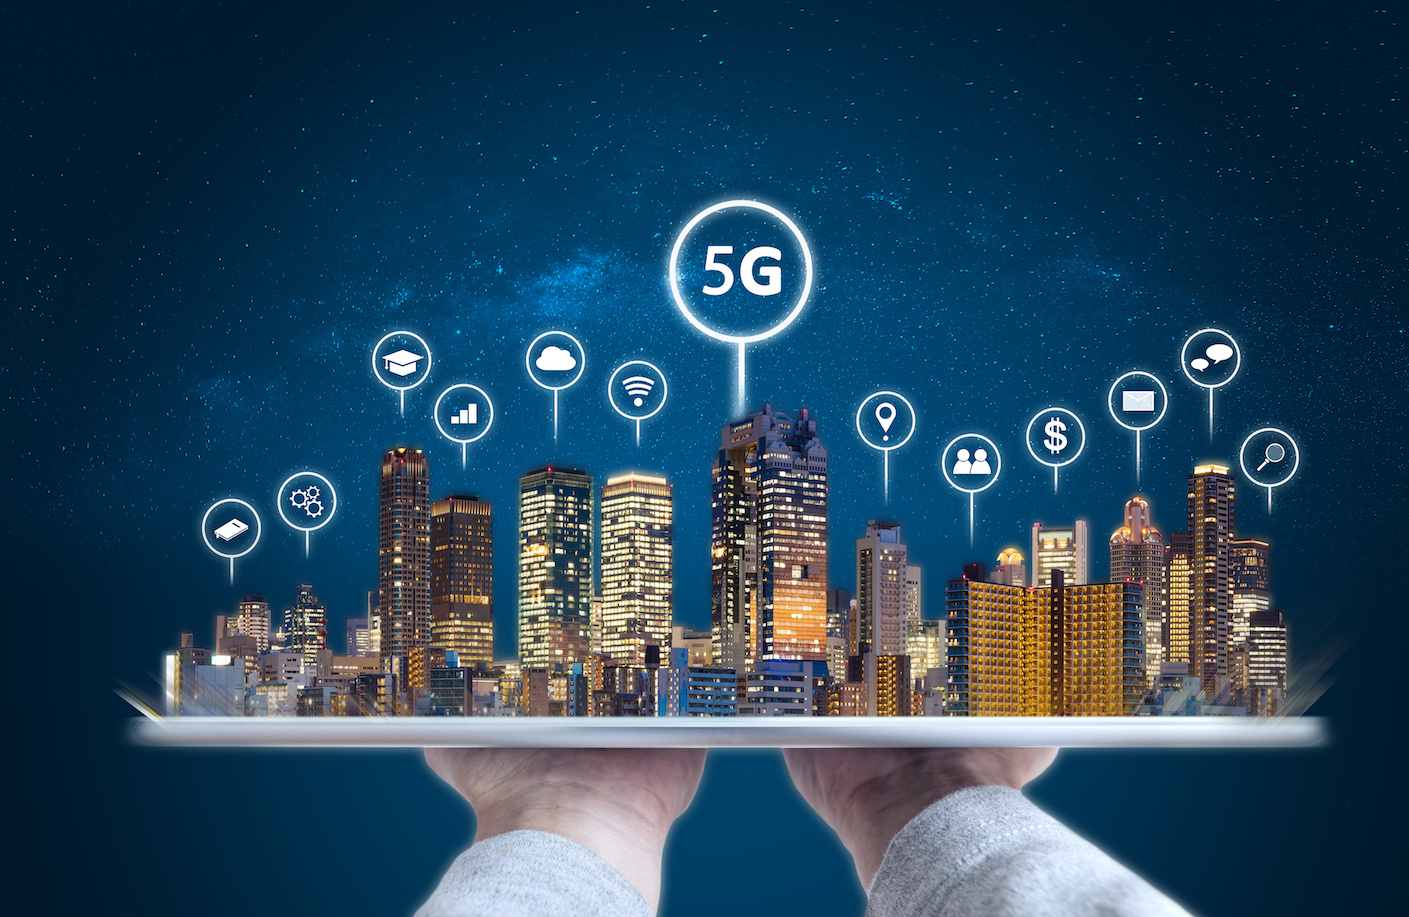 Como o 5G pode mudar a forma de transmitir ao vivo?